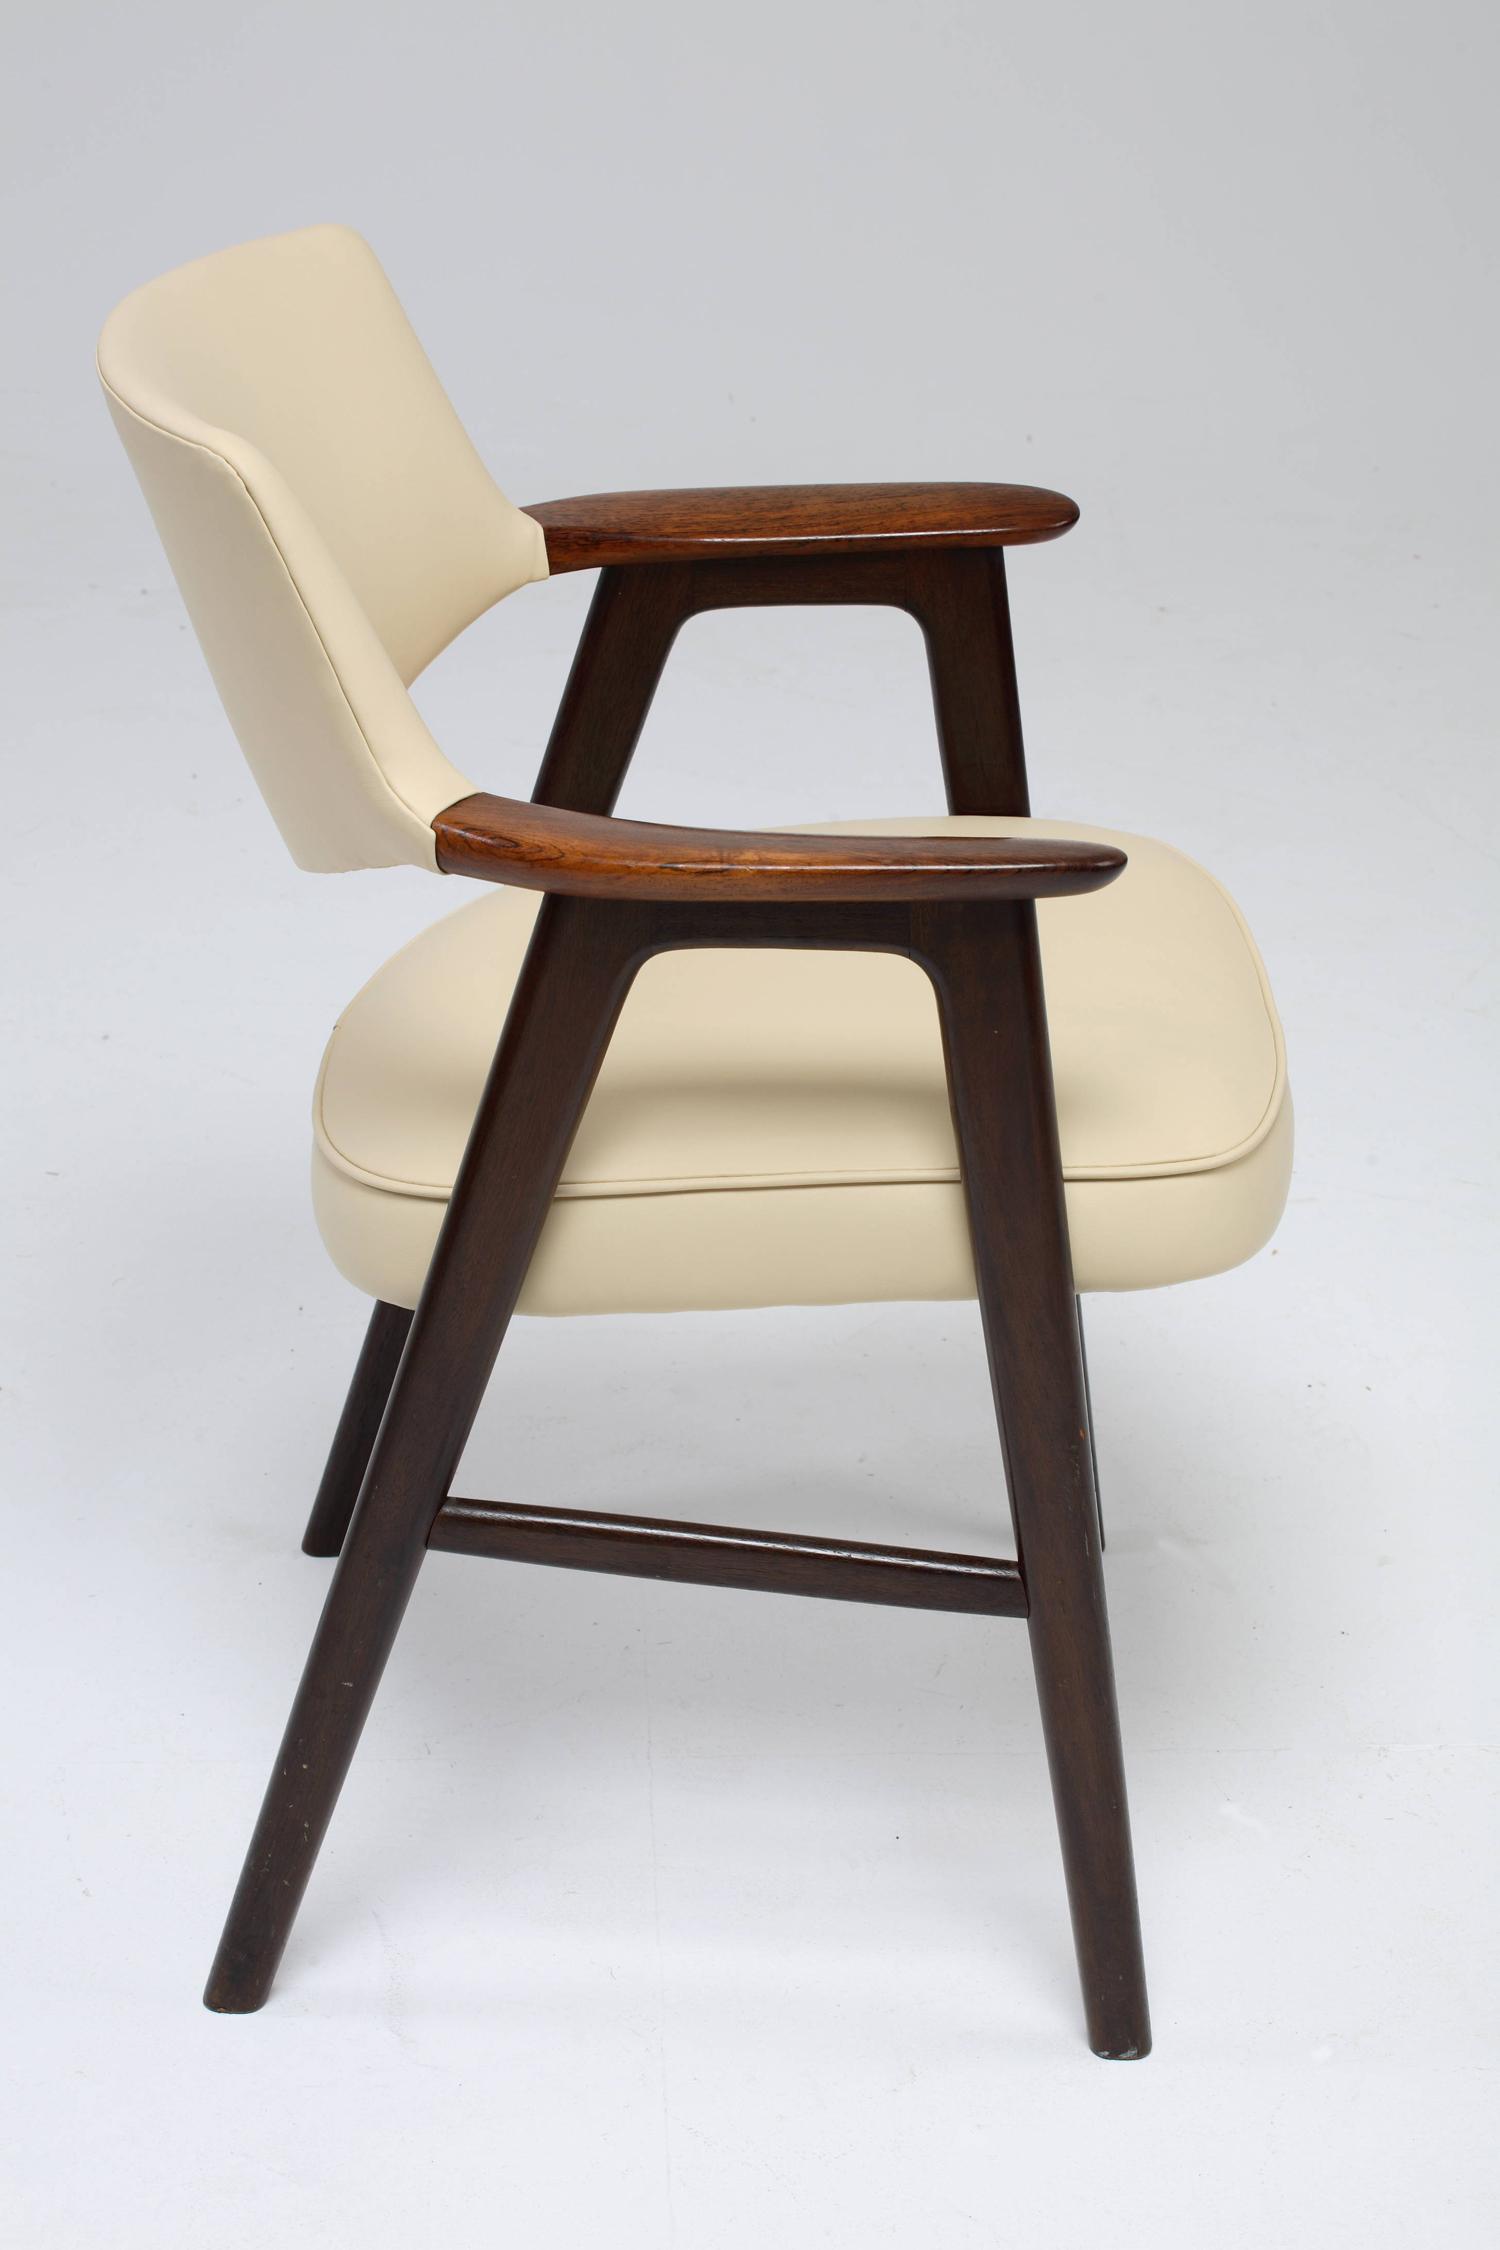 Chair_7_003_resize.jpg